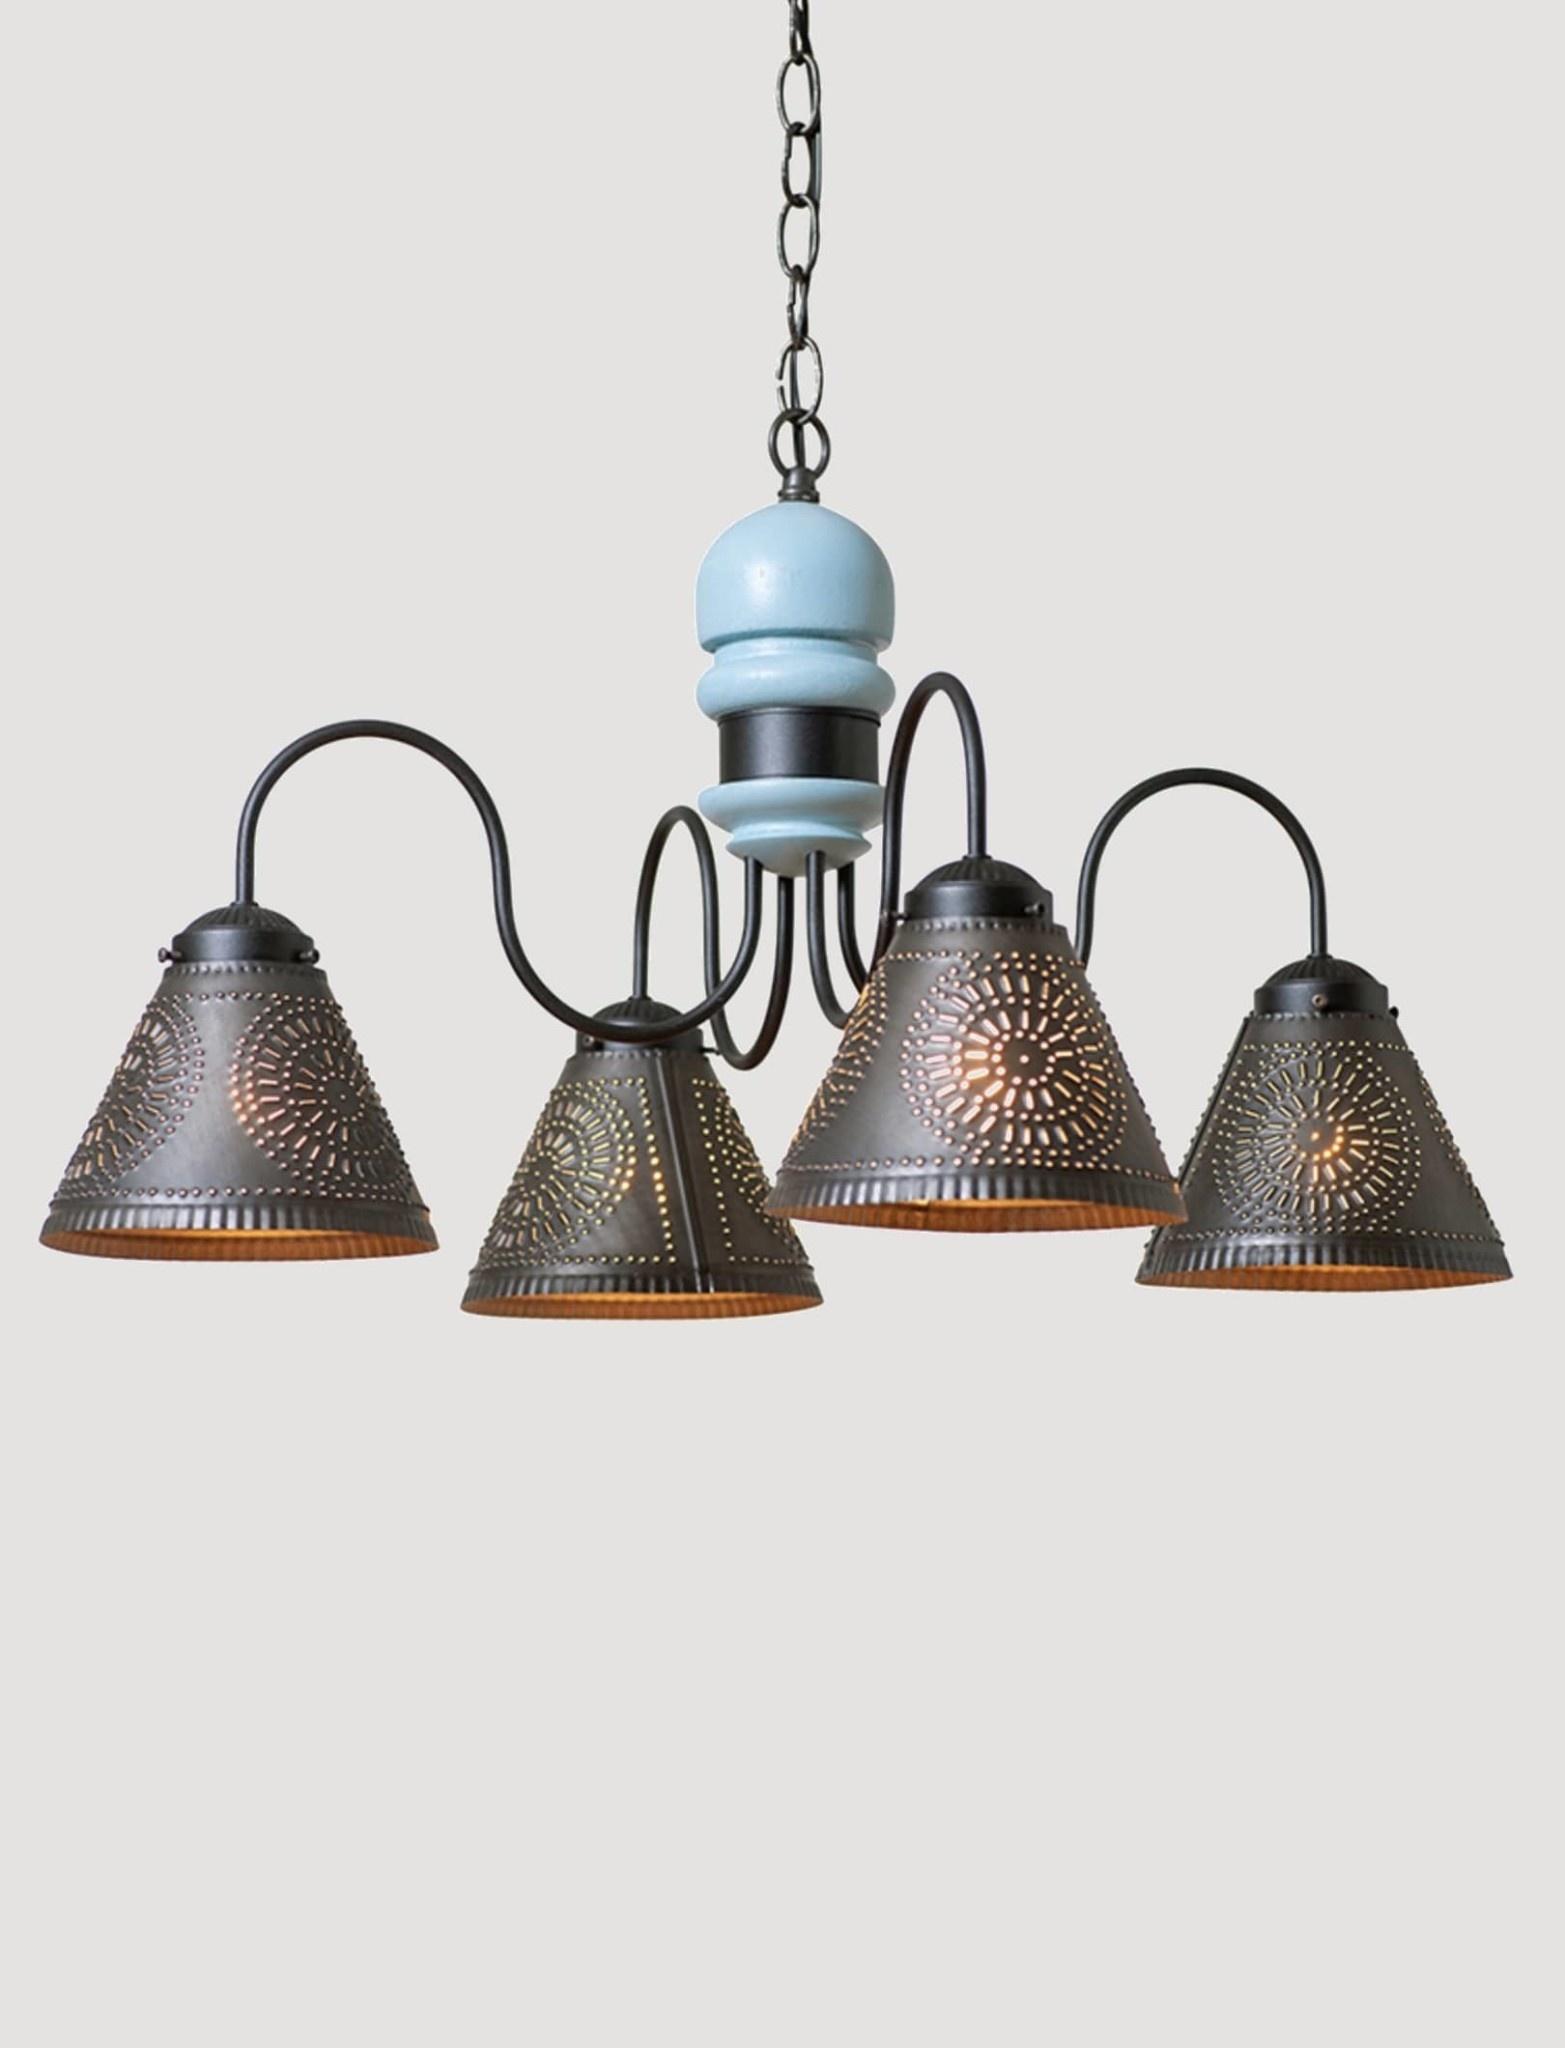 Irvin's Tinware Cambridge Chandelier 4 Light